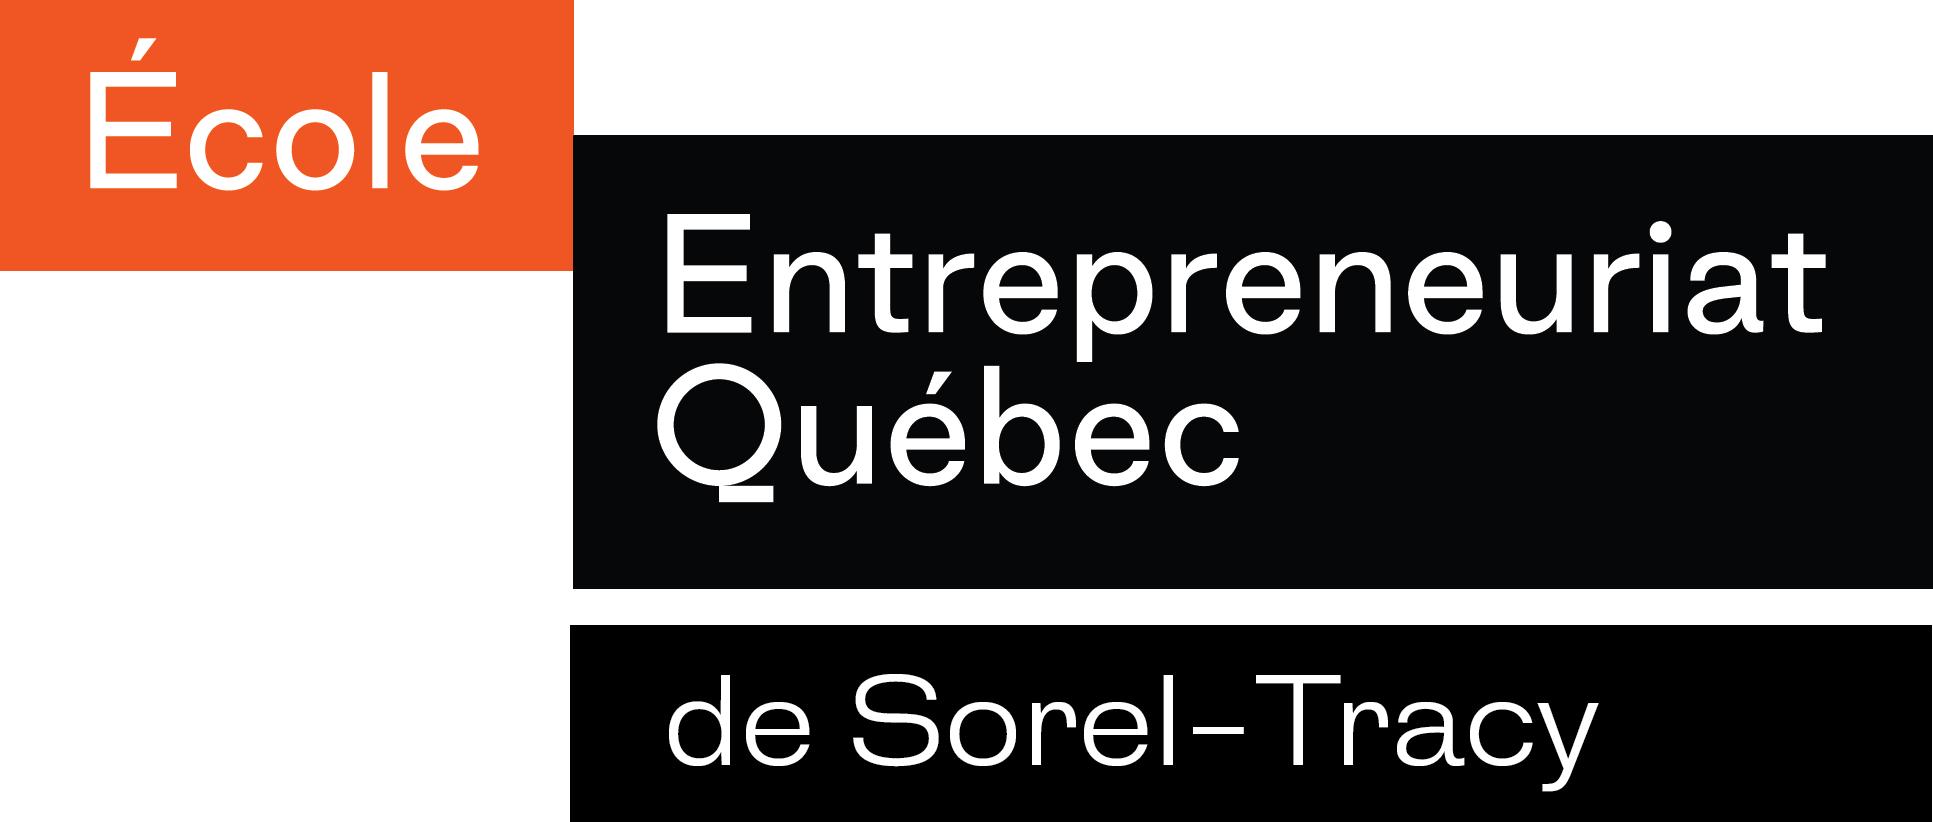 Logos ÉEQ de Sorel-Tracy.jpg